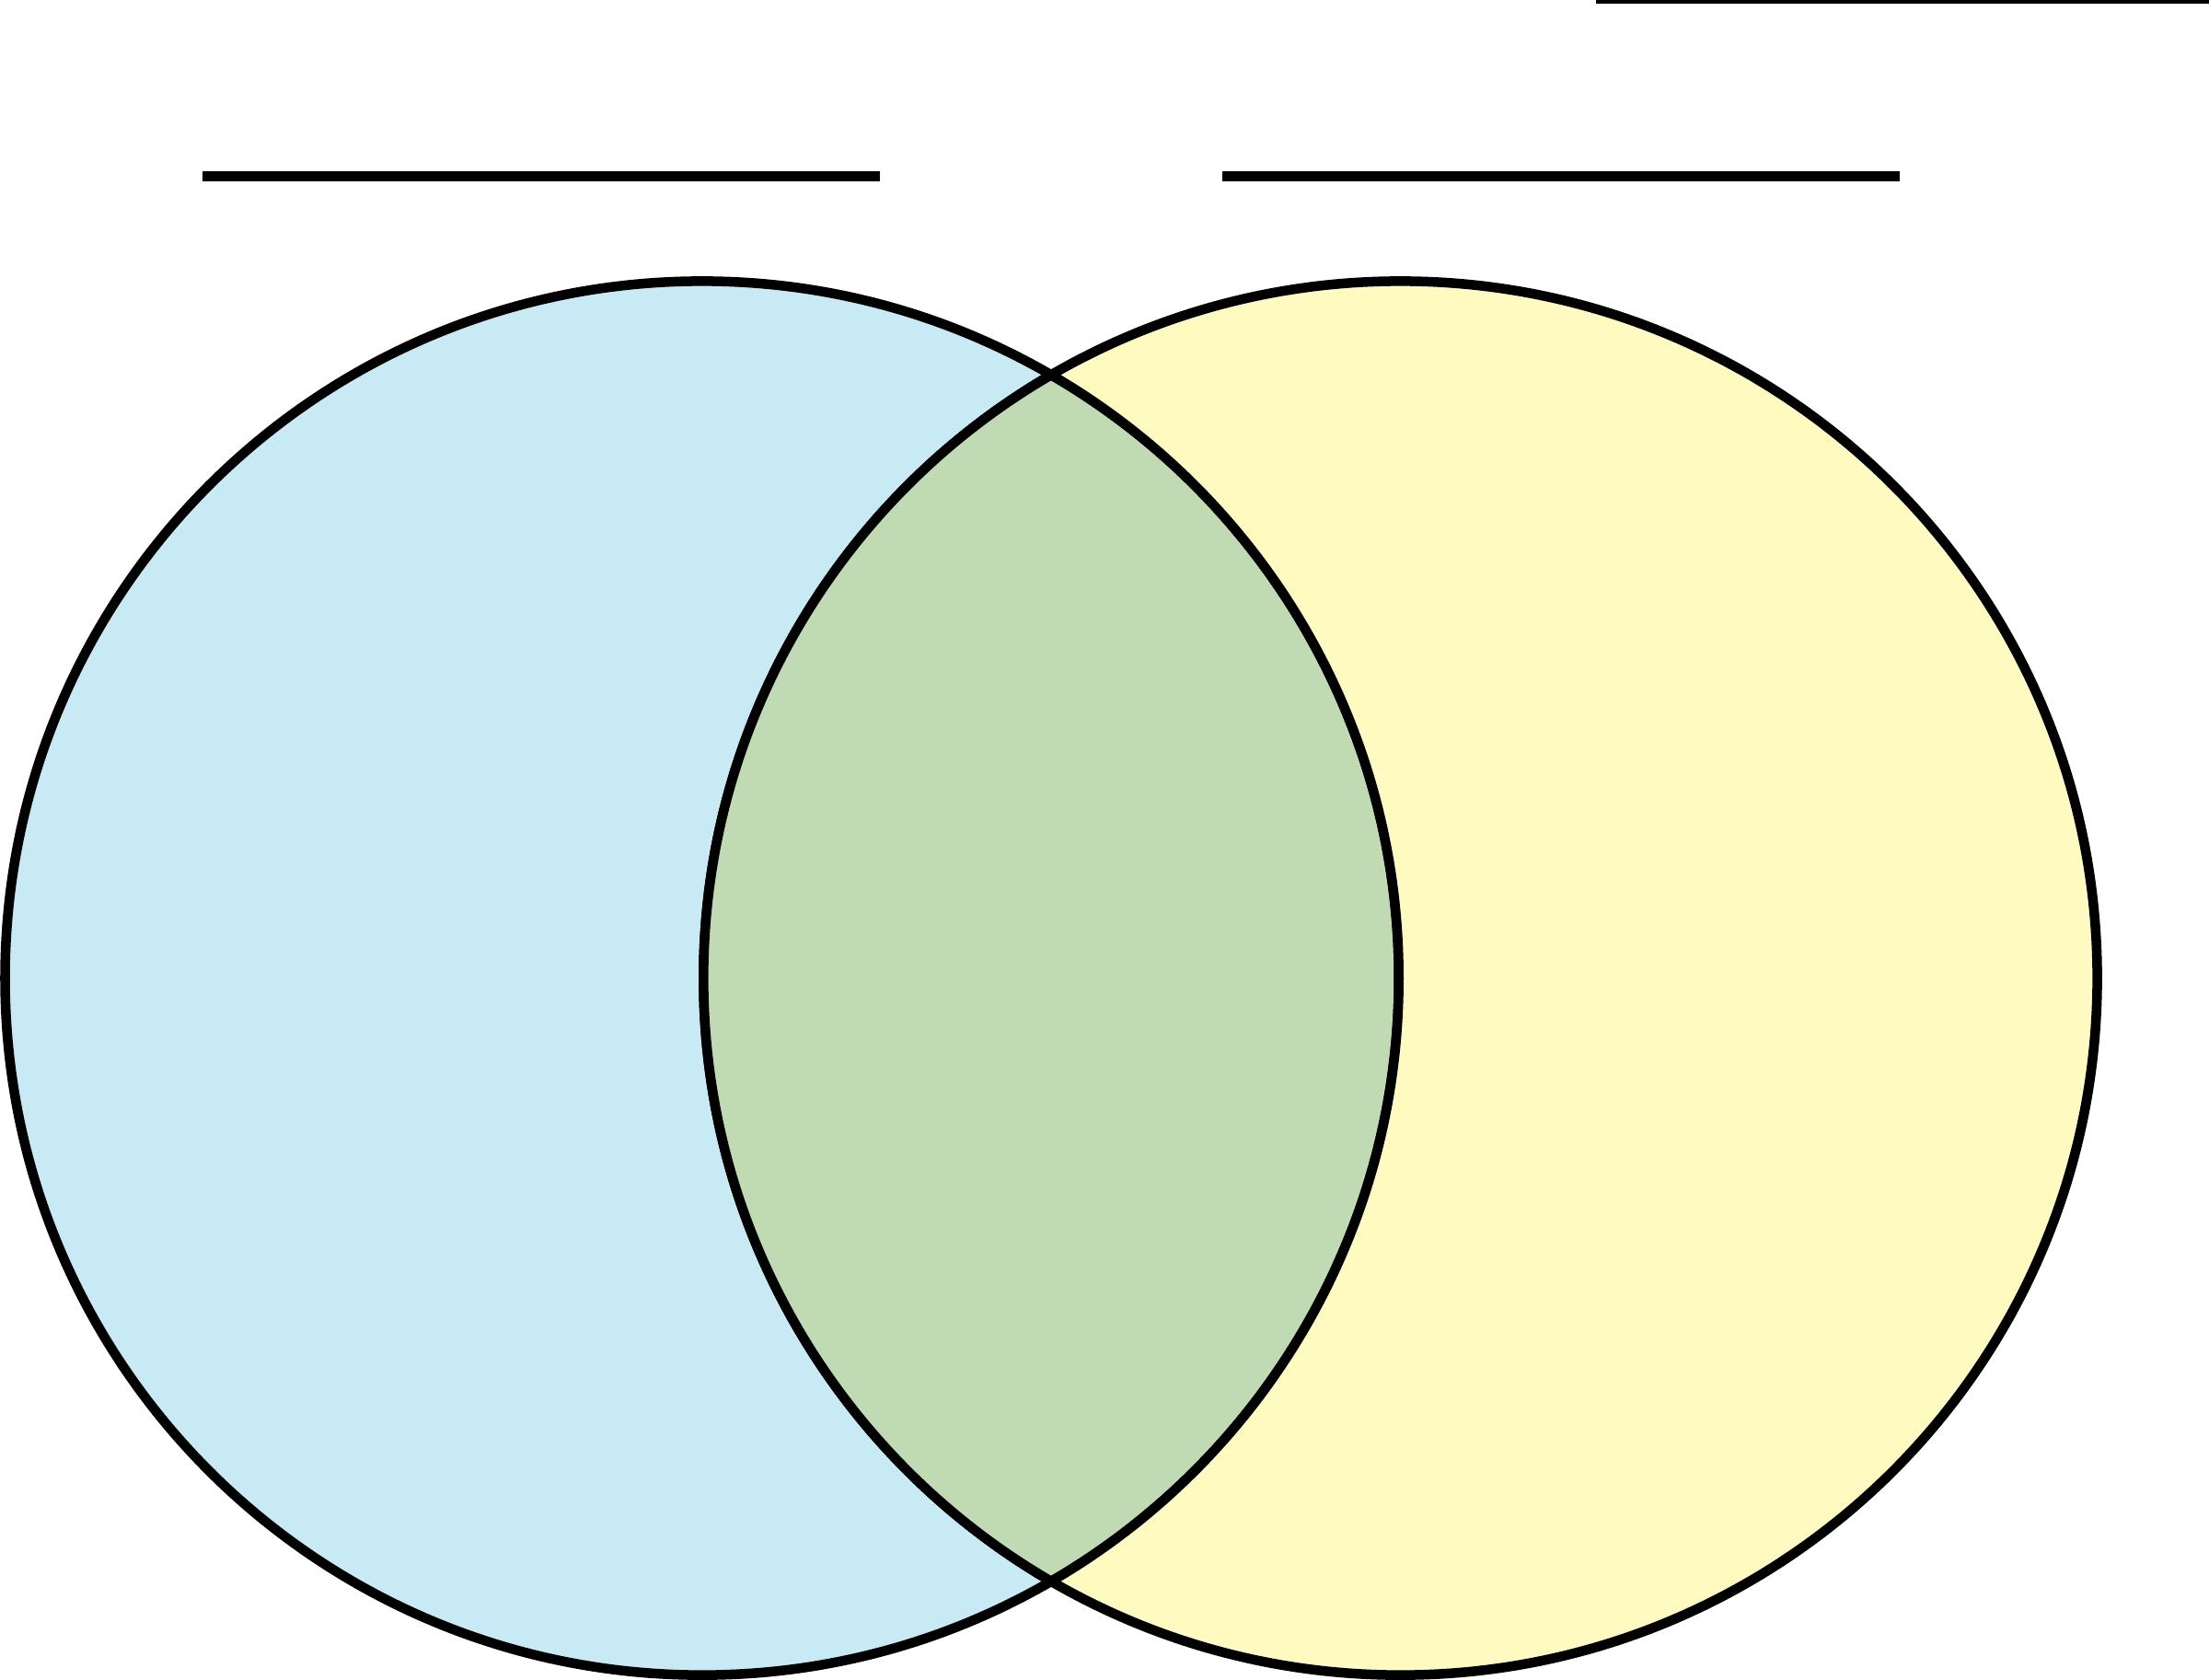 Mitosis Meiosis Venn Diagram Circle Venn Diagram Transparent Png Clipart Free Download